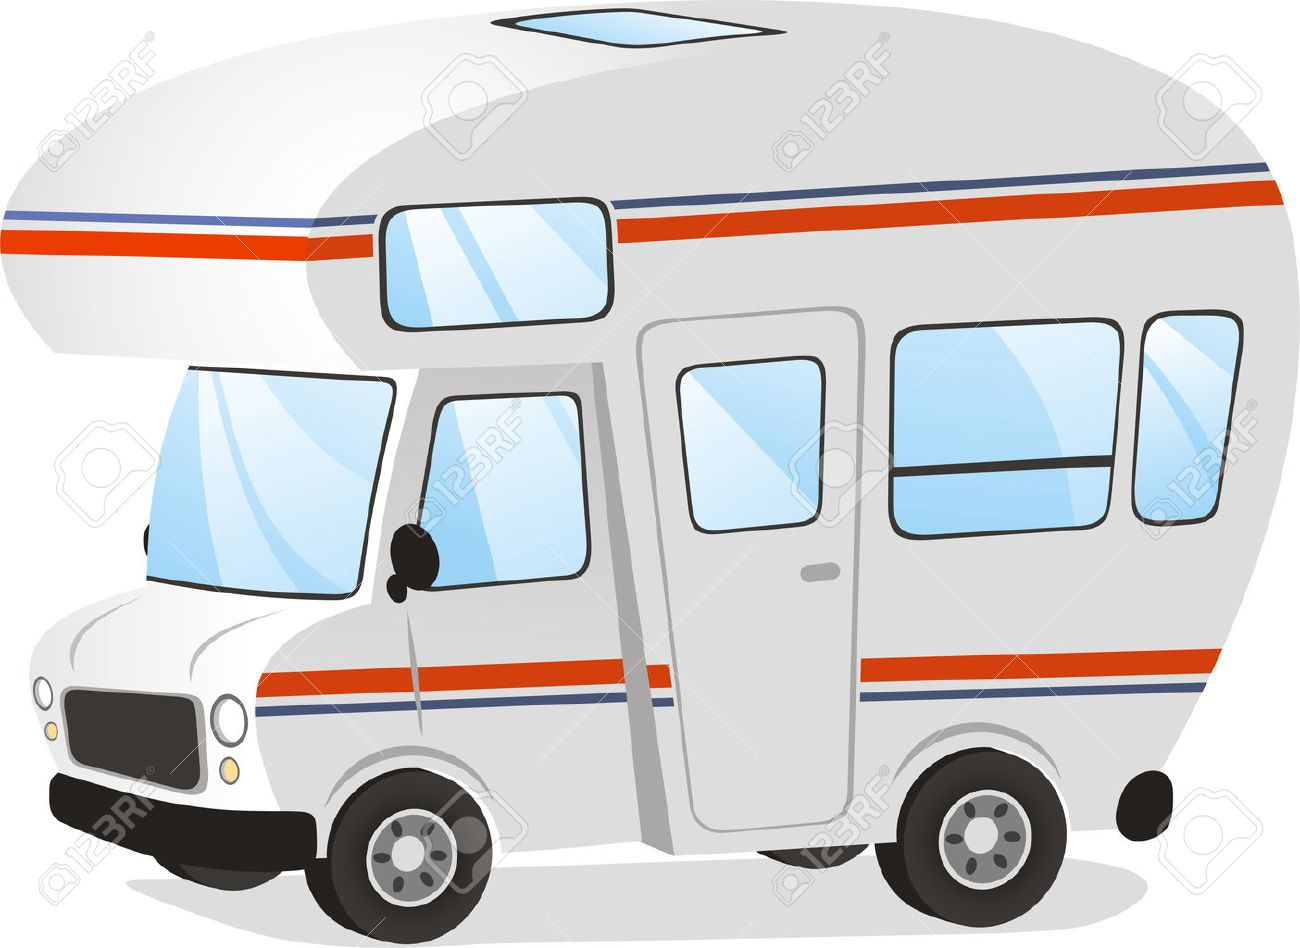 Mobile Home Motorhome Caravan Trailer Vehicle, Vector Illustration ...